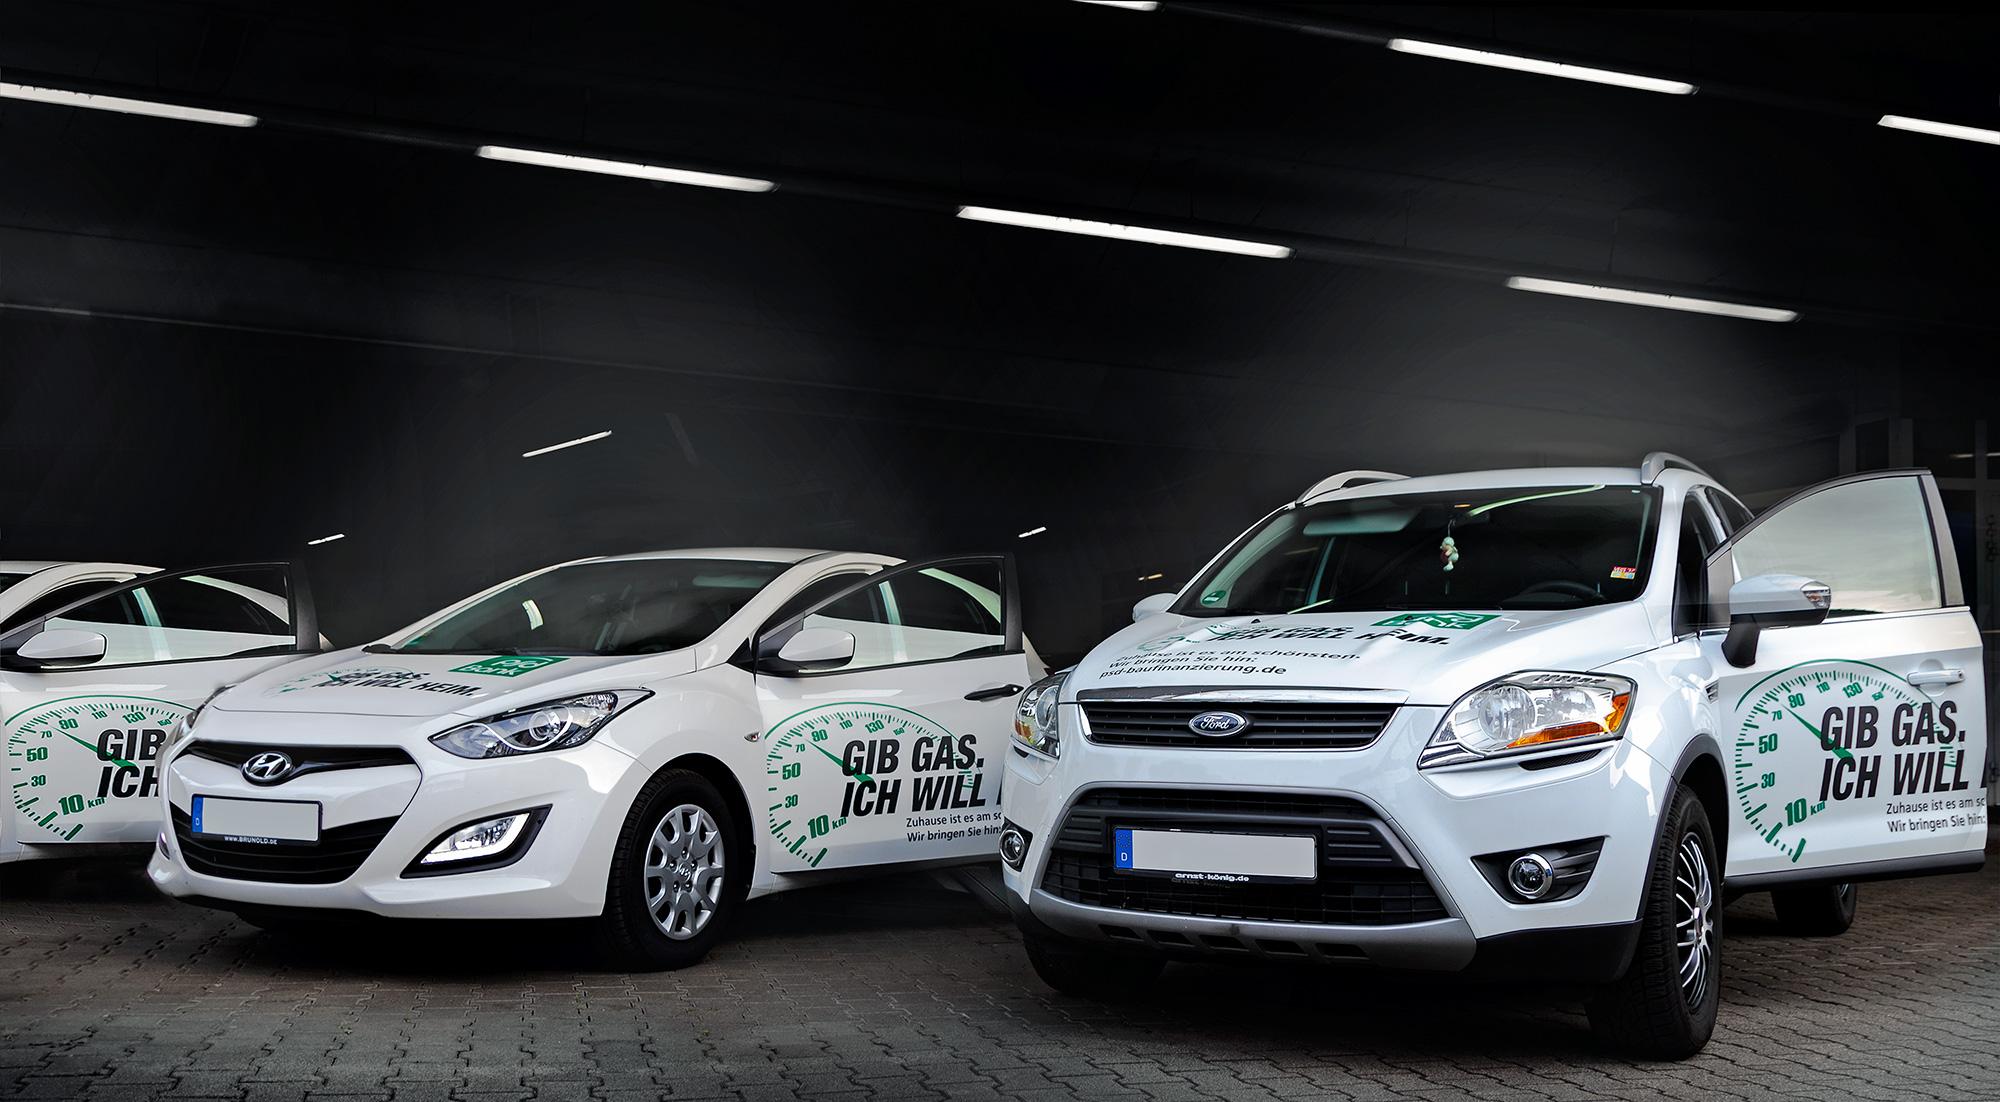 Wrapclub: Mit Autowerbung Geld verdienen | NEBENJOB-ZENTRALE